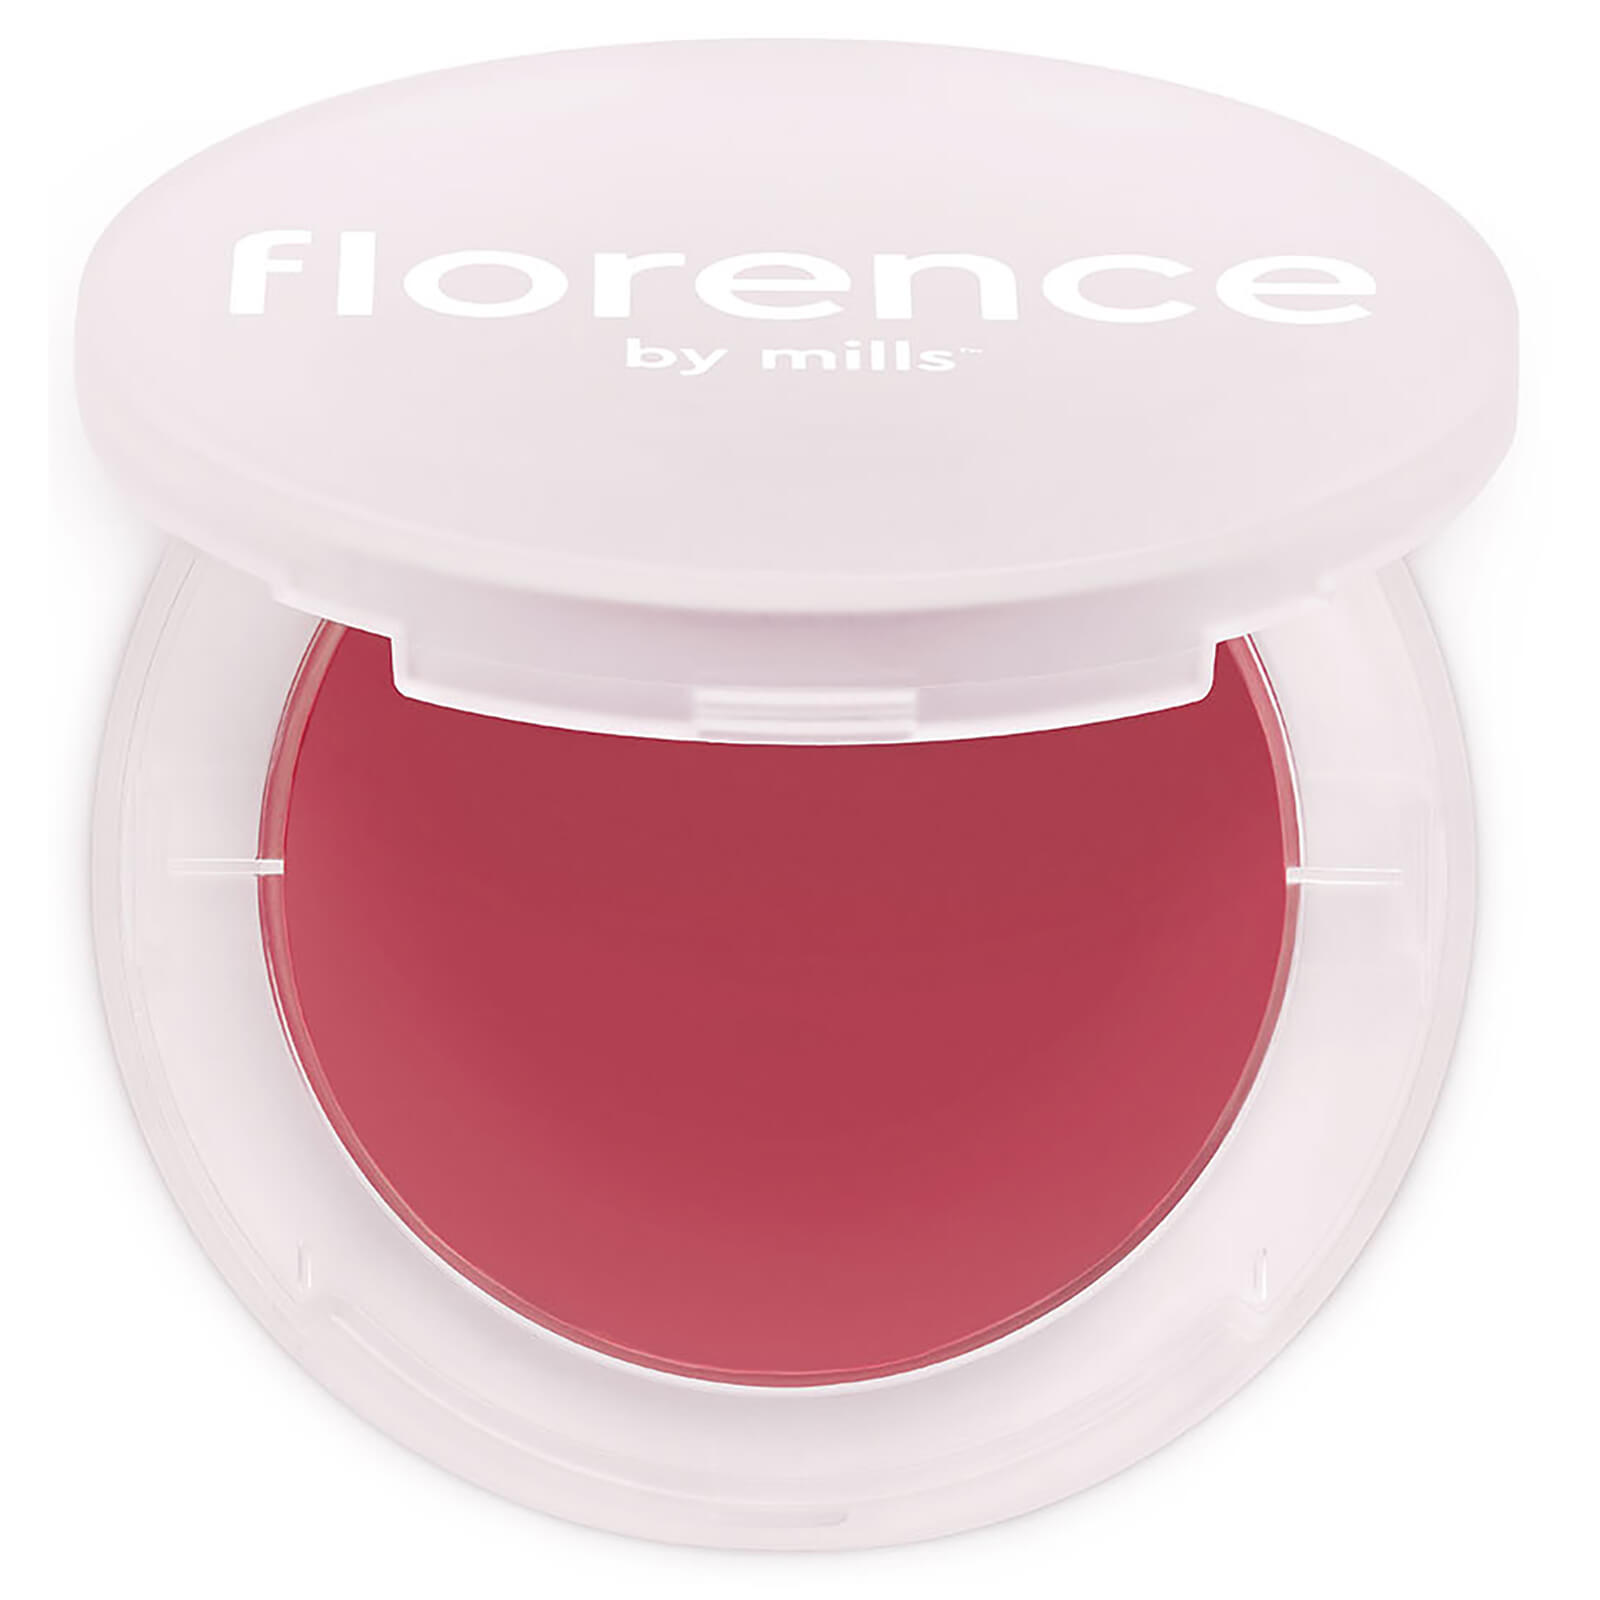 Купить Florence by Mills Cheek Me Later Cream Blush - Glowing G 4.5g